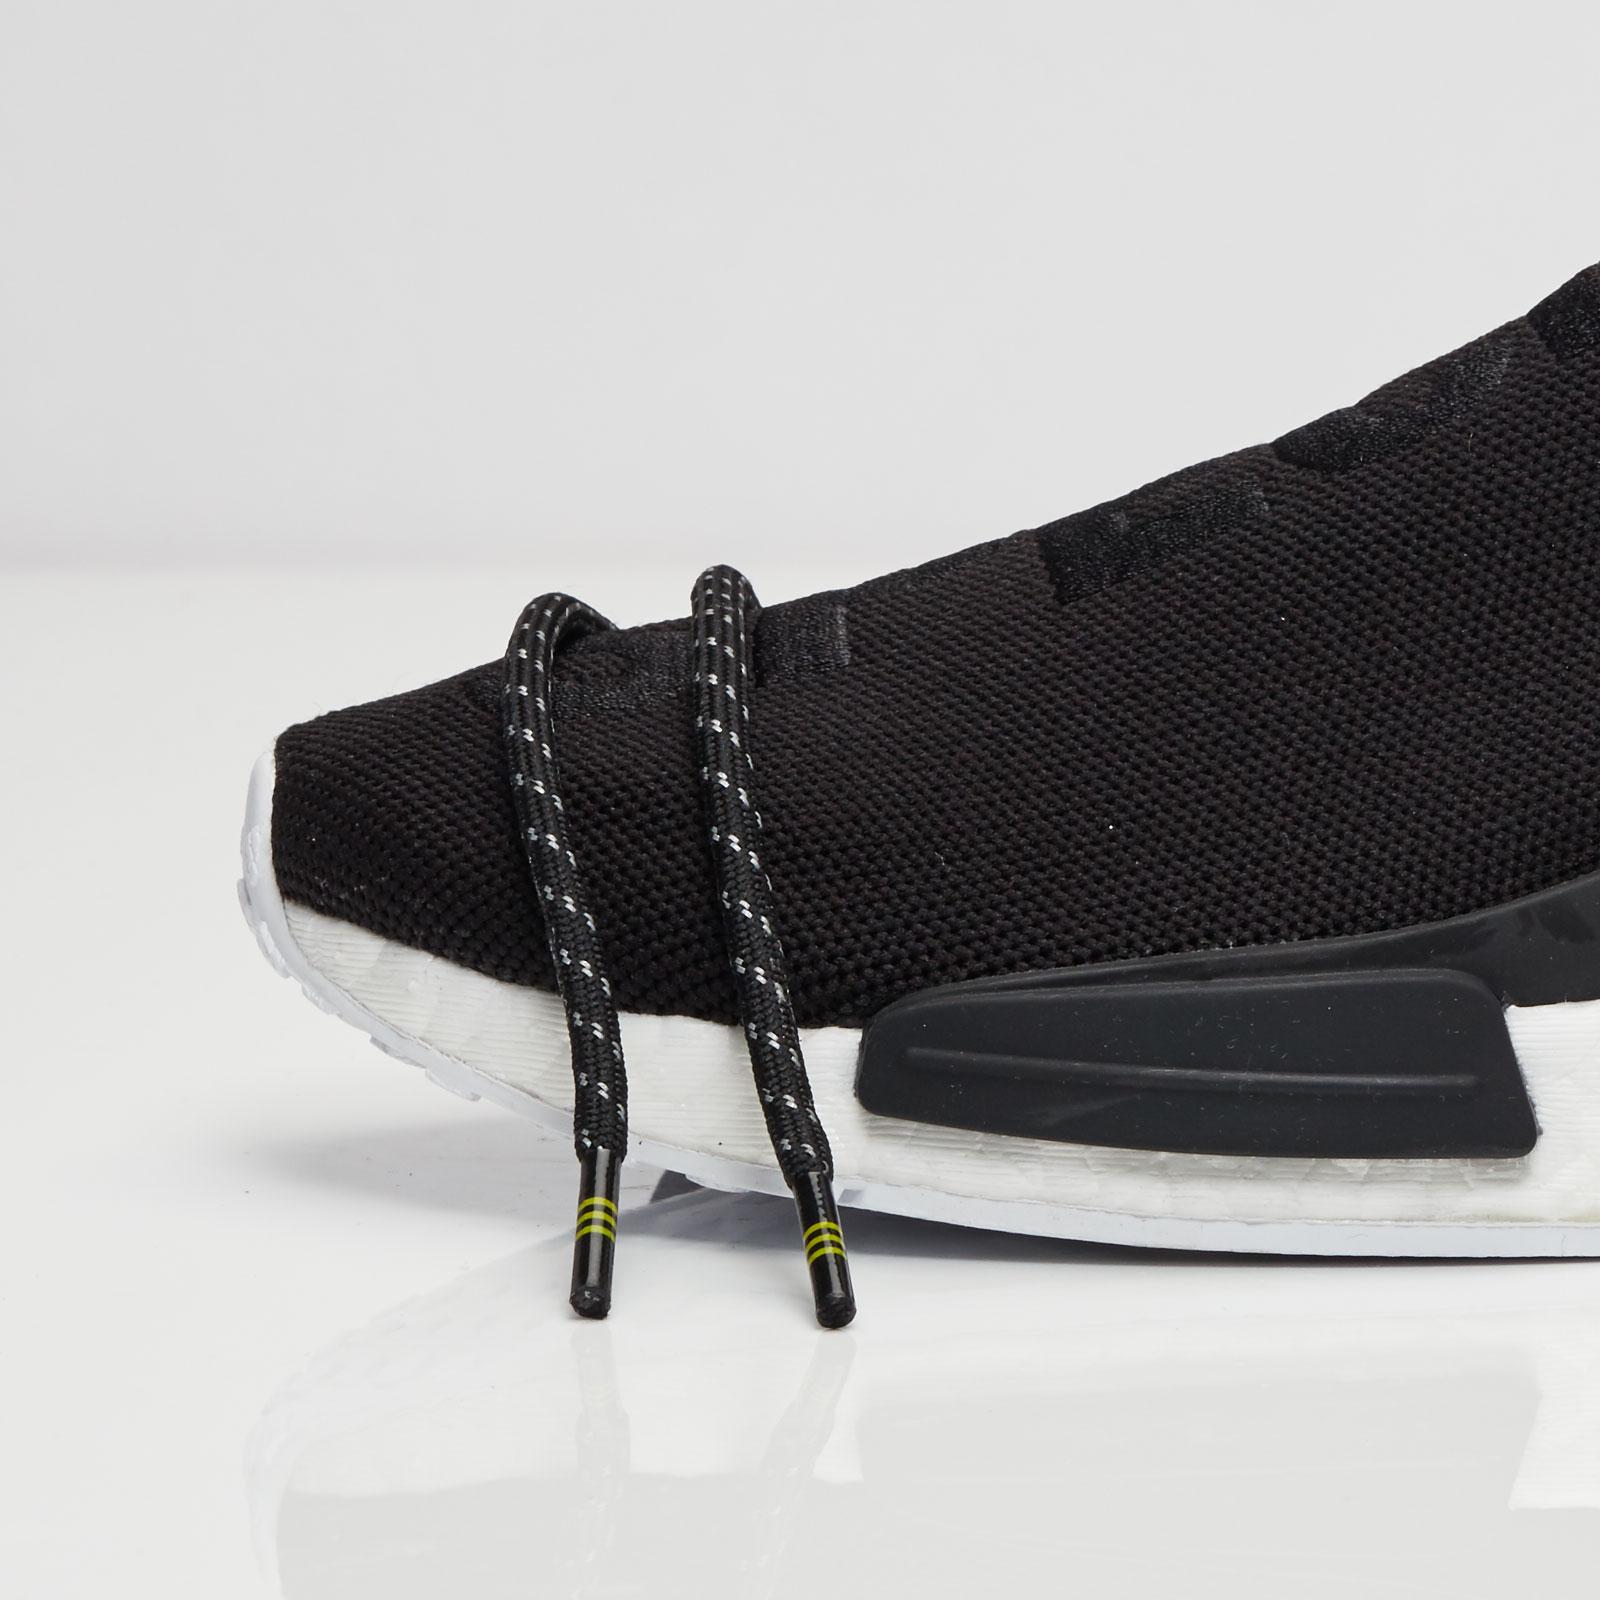 39cffe70b adidas PW Human Race NMD - Bb3068 - Sneakersnstuff